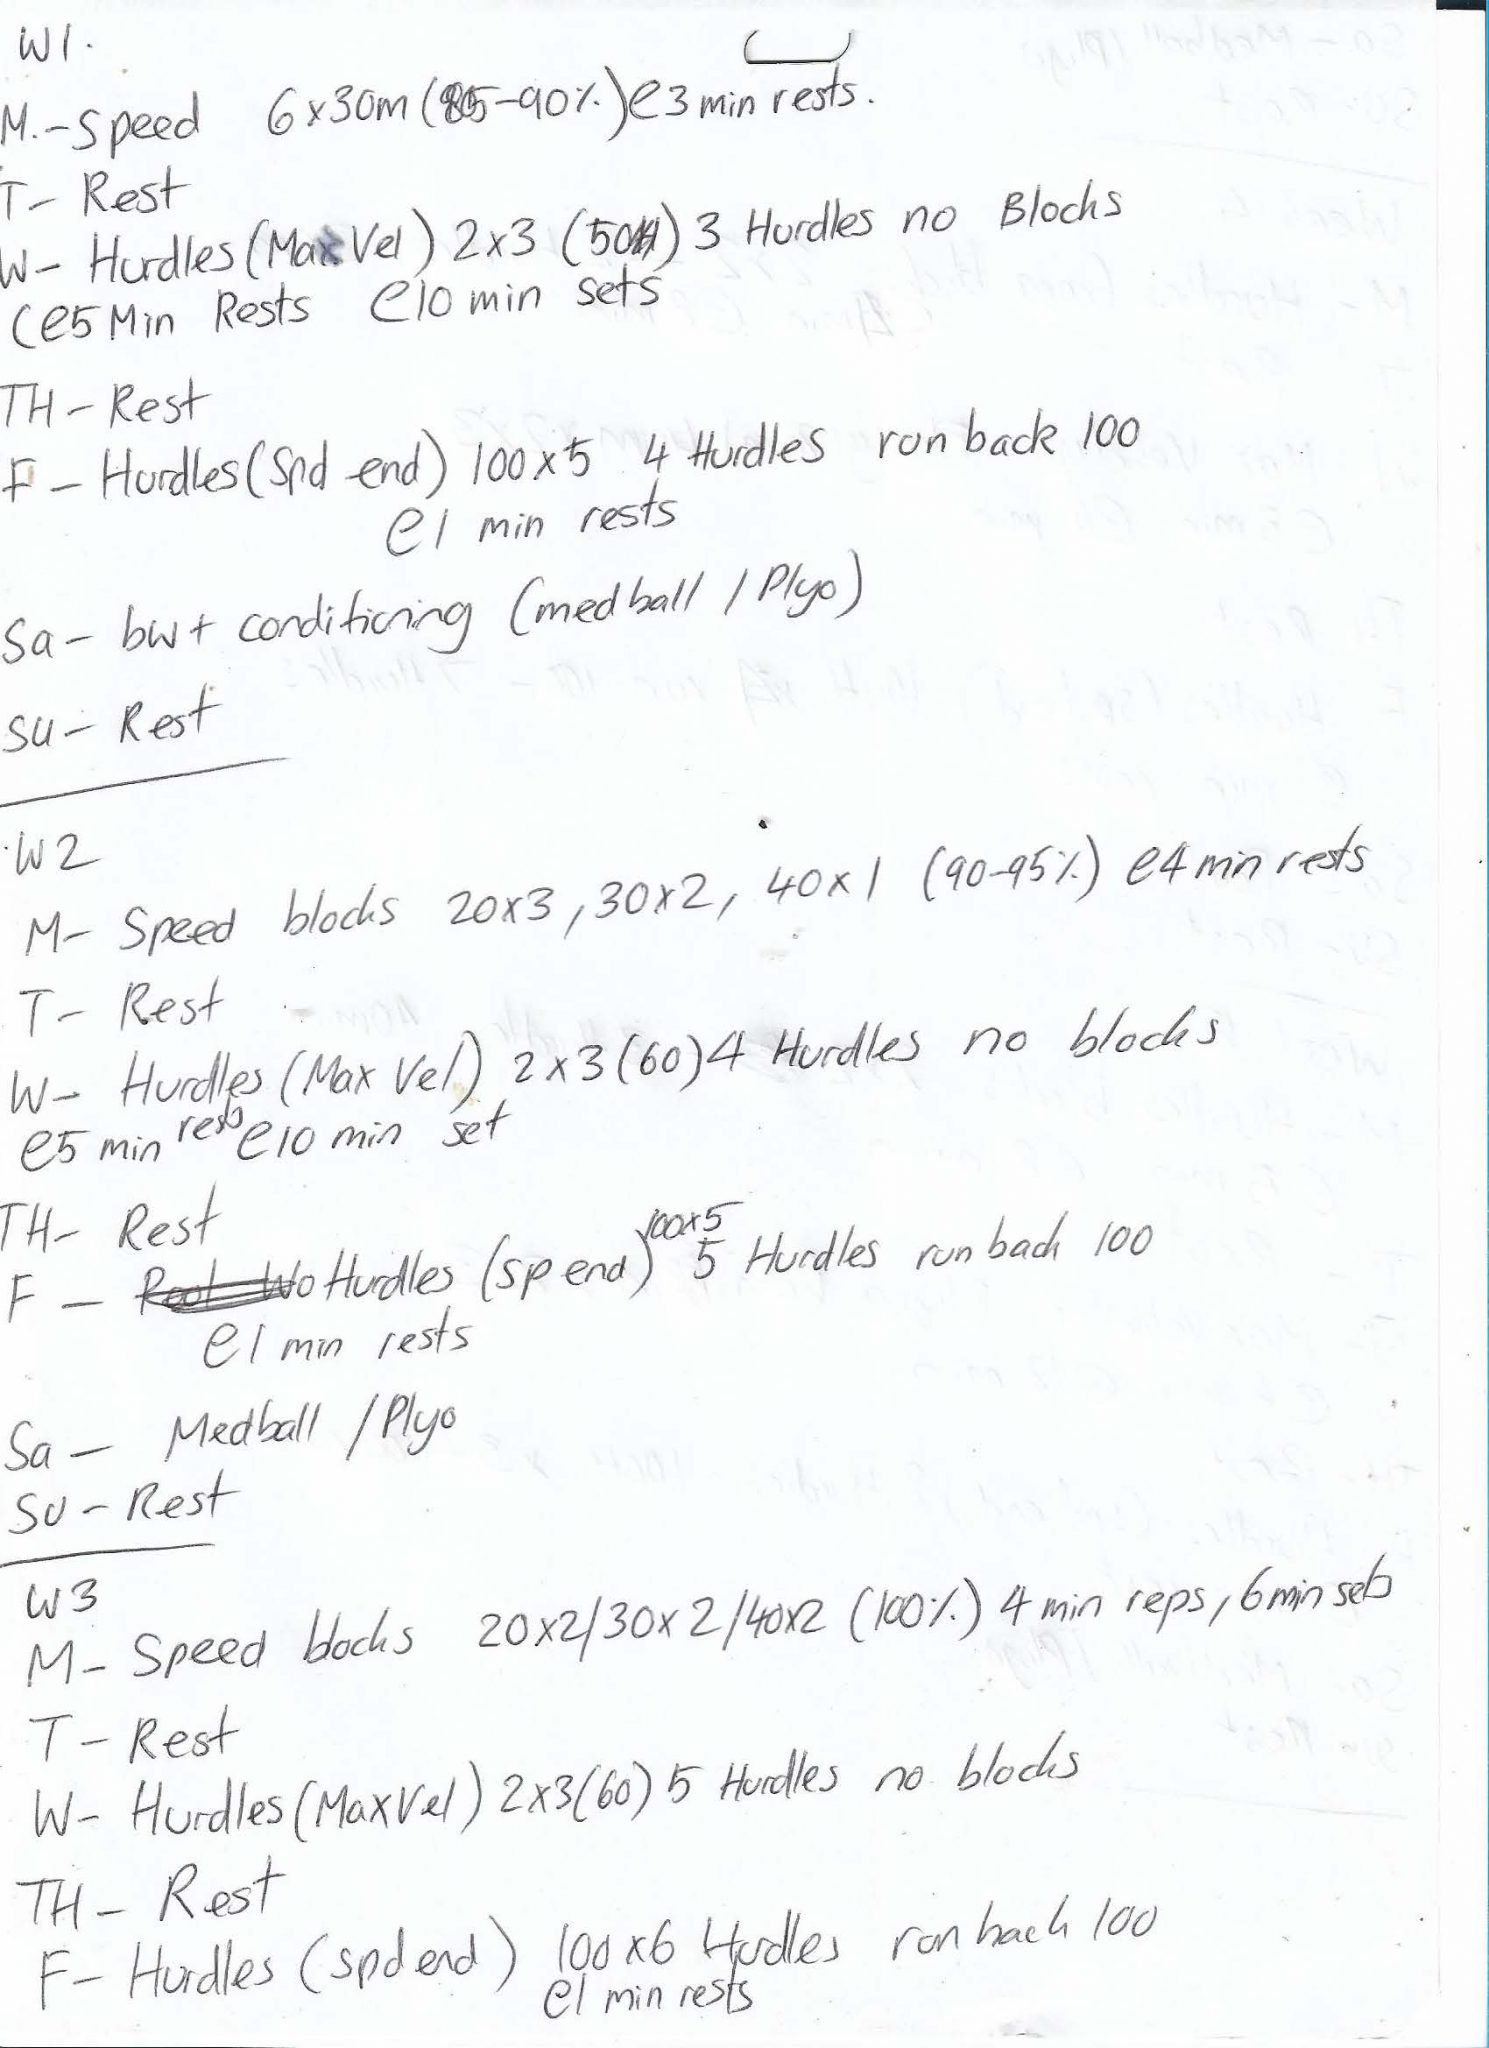 Breakthrough Basic Hurdles Training 100 / 110H and Spacing 1